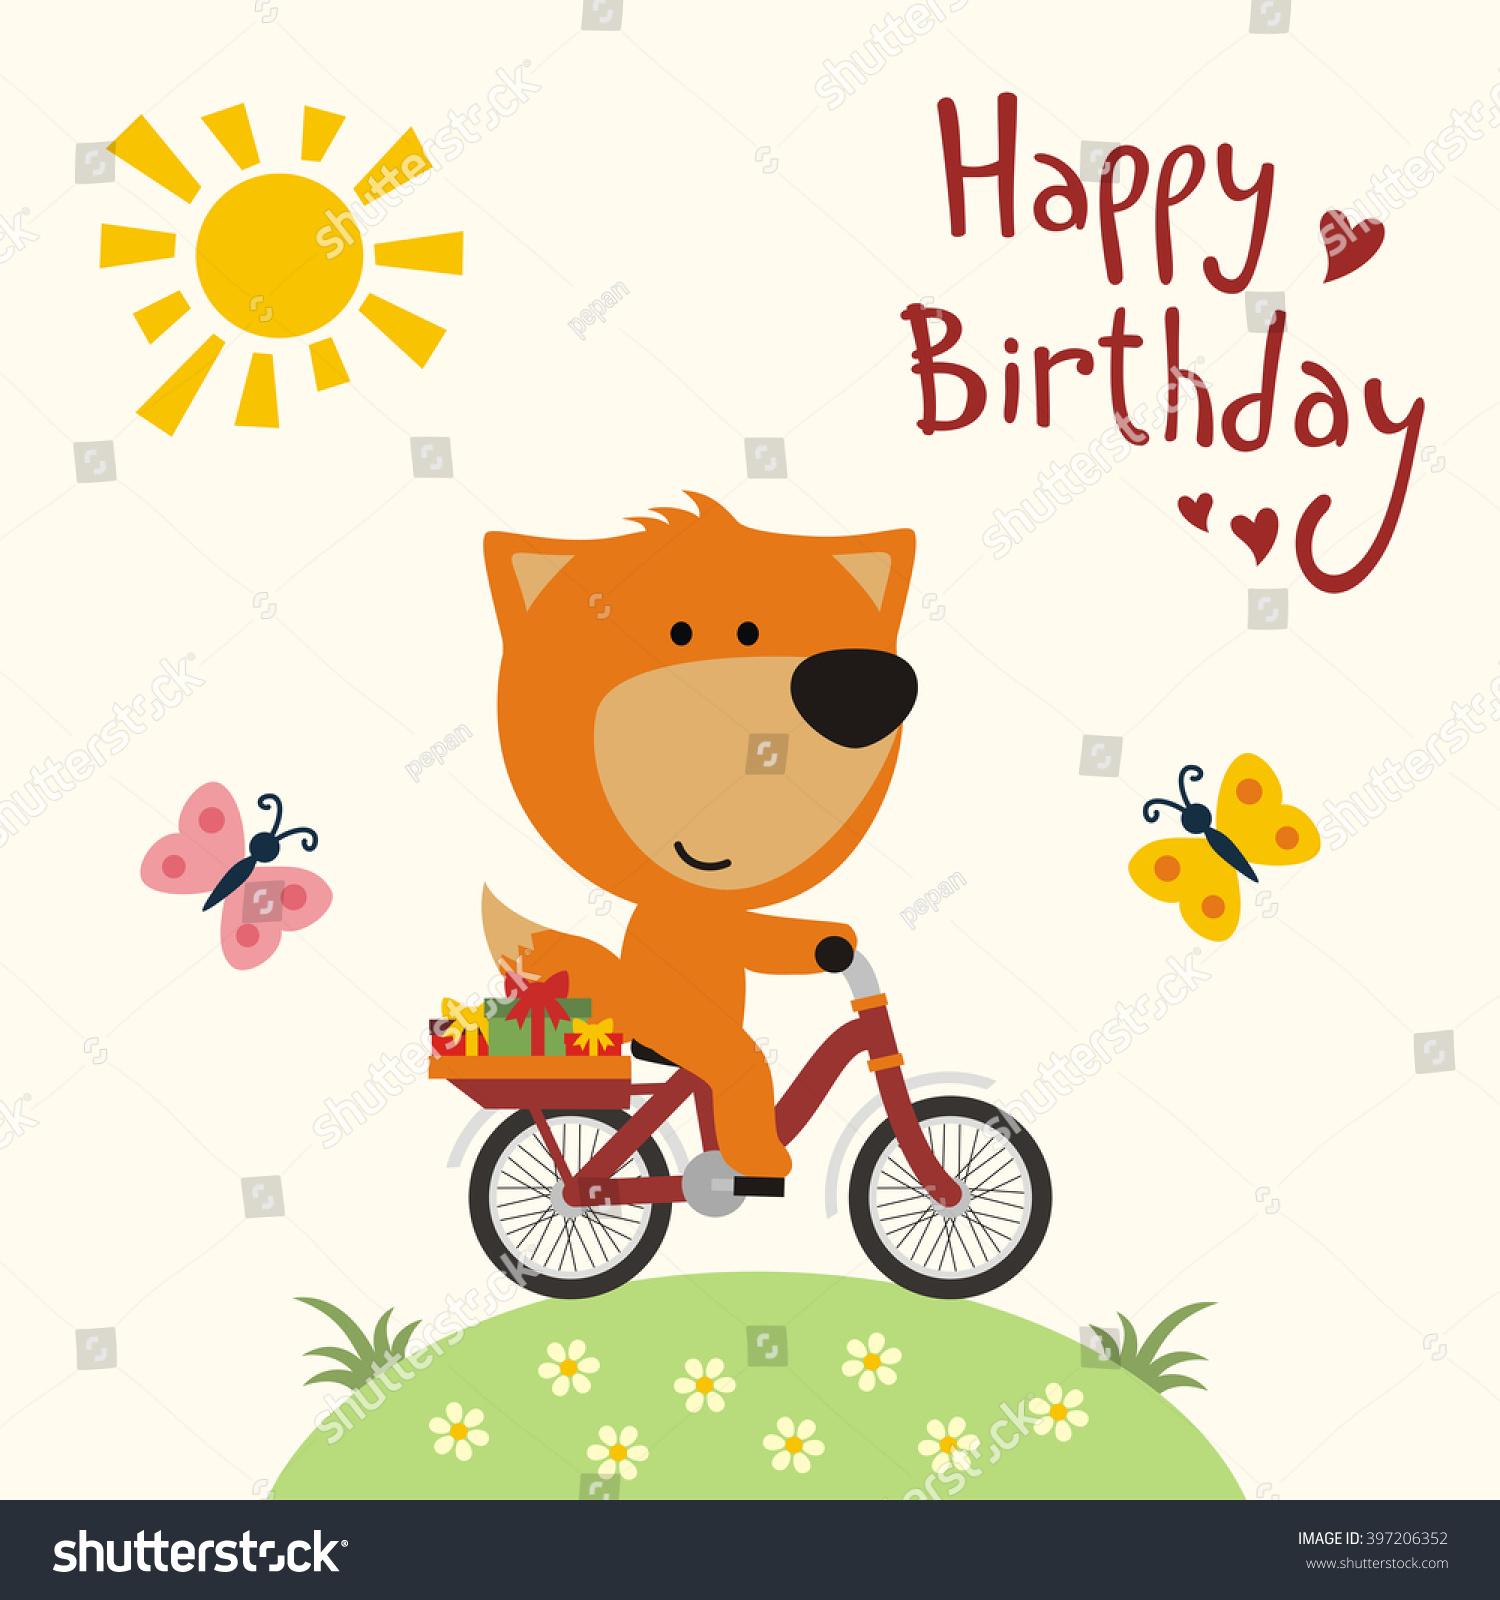 Happy Birthday Funny Fox Bicycle Stock Vector